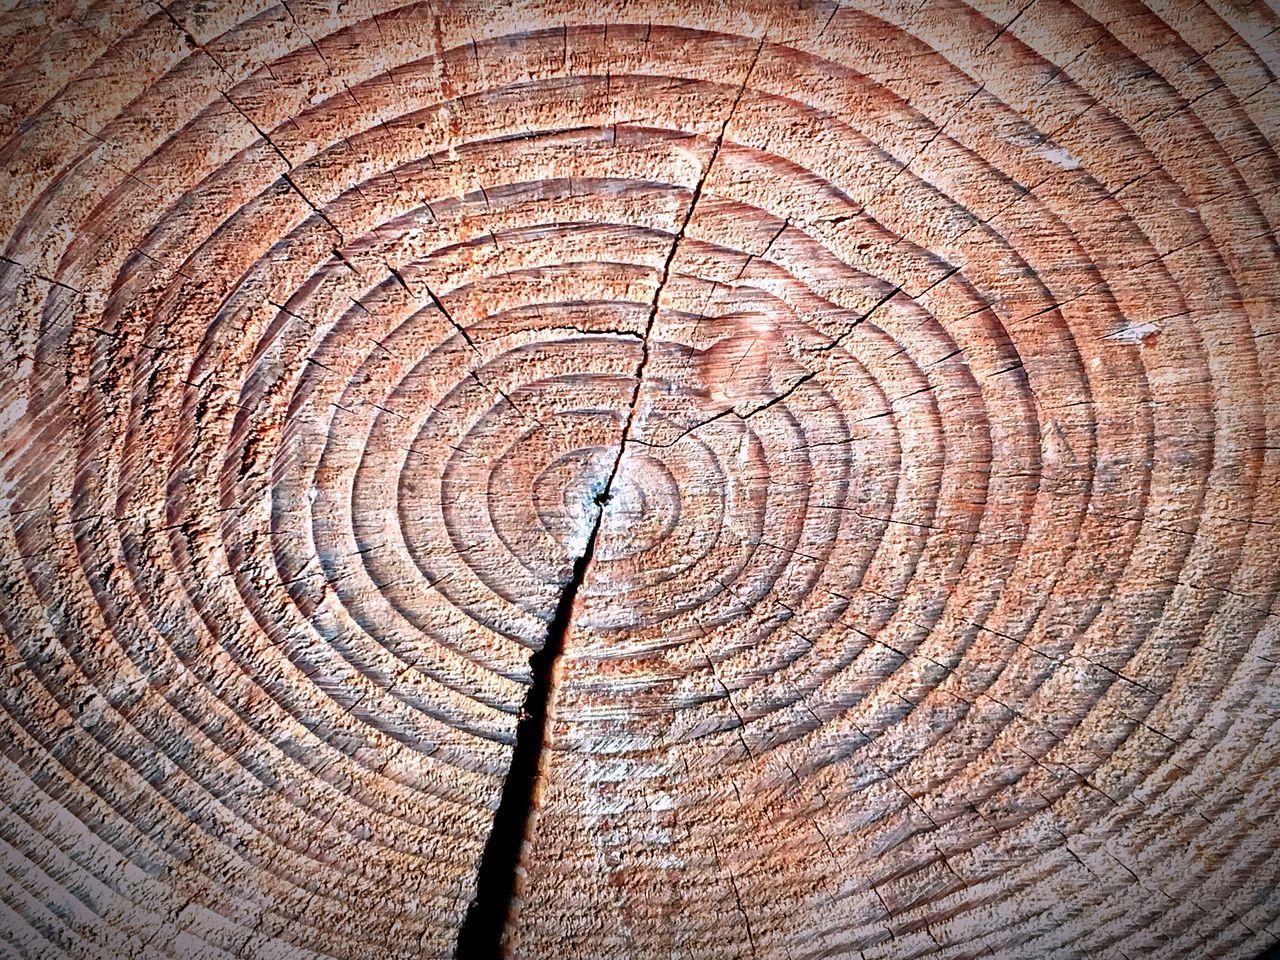 EyeEm Nature Lover Tree Trunk Tree Miracel Aged Aging Process